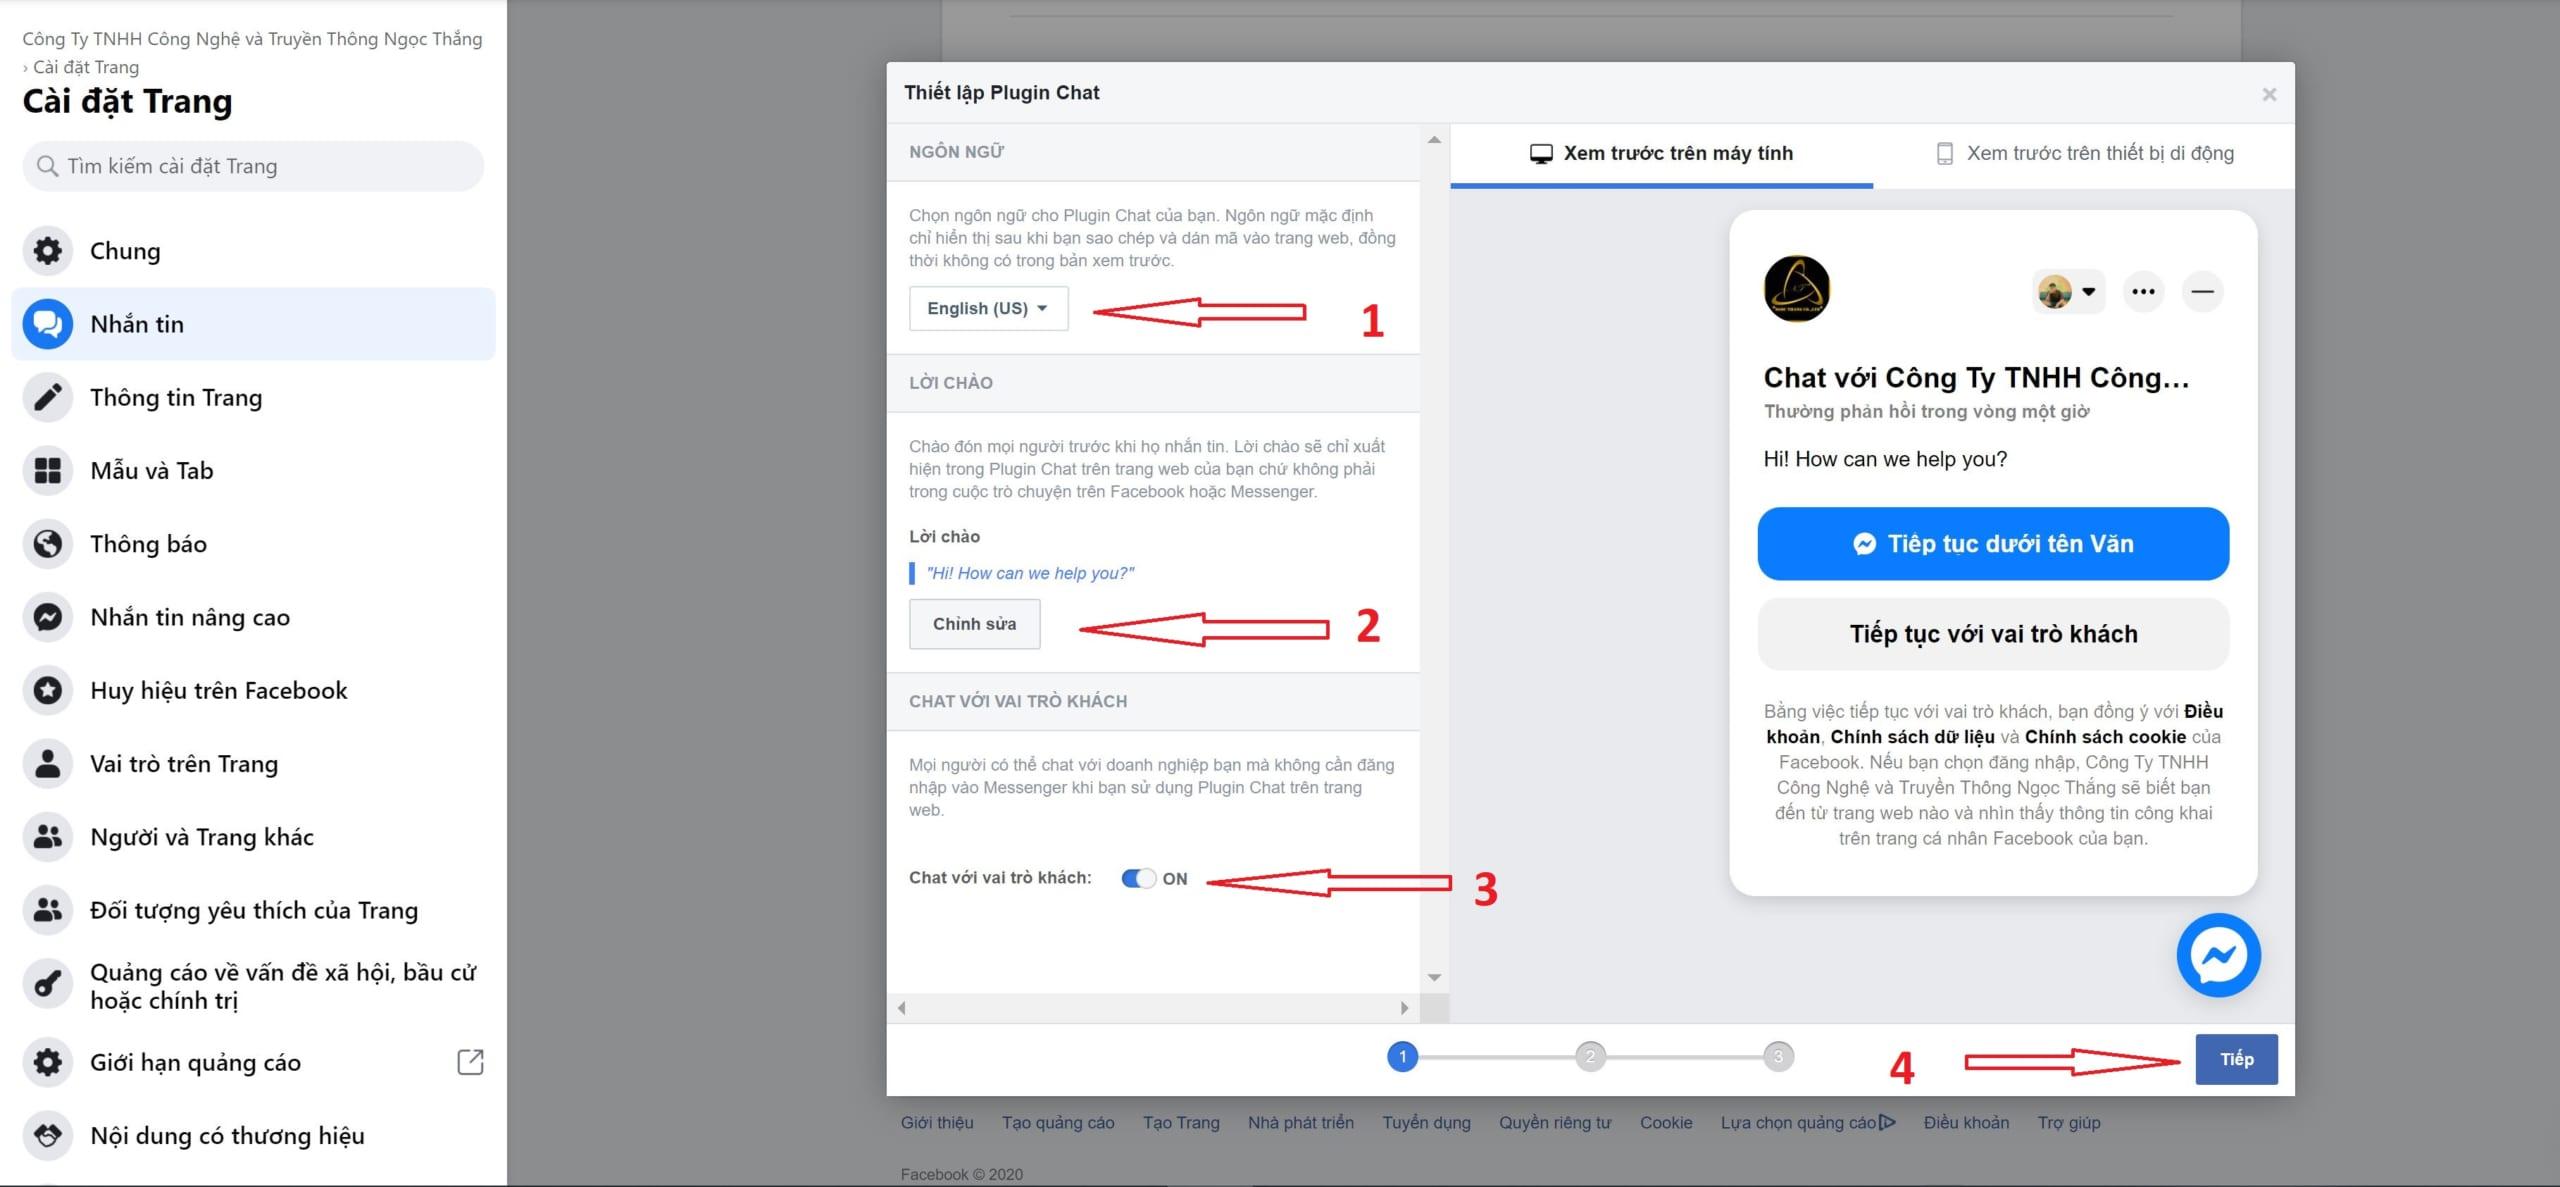 Thiết lập plugin chat